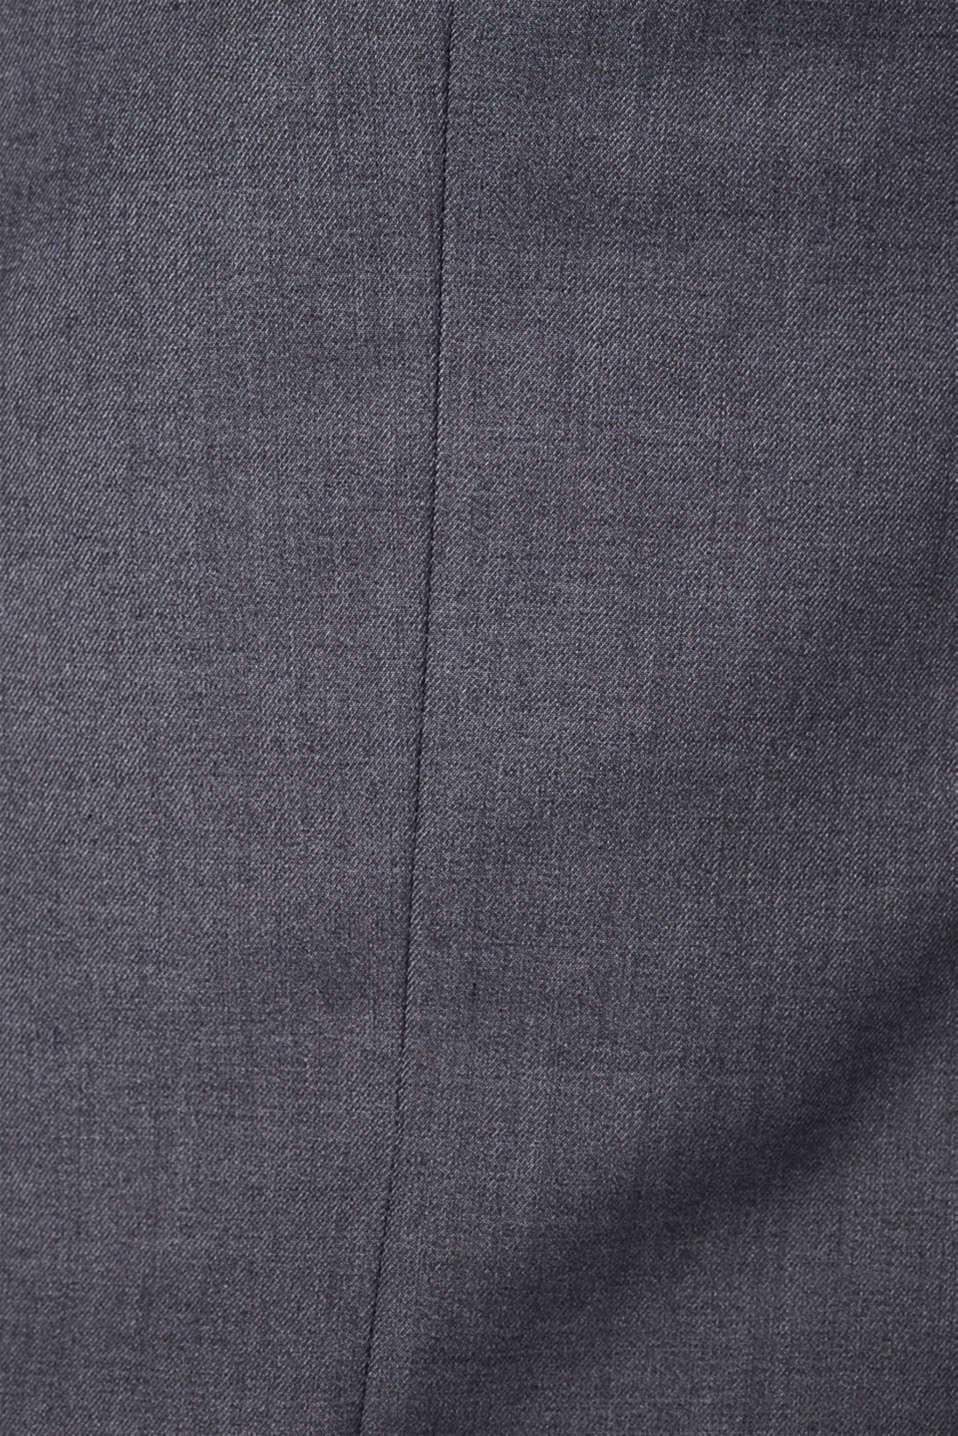 Blazers suit, GREY, detail image number 4